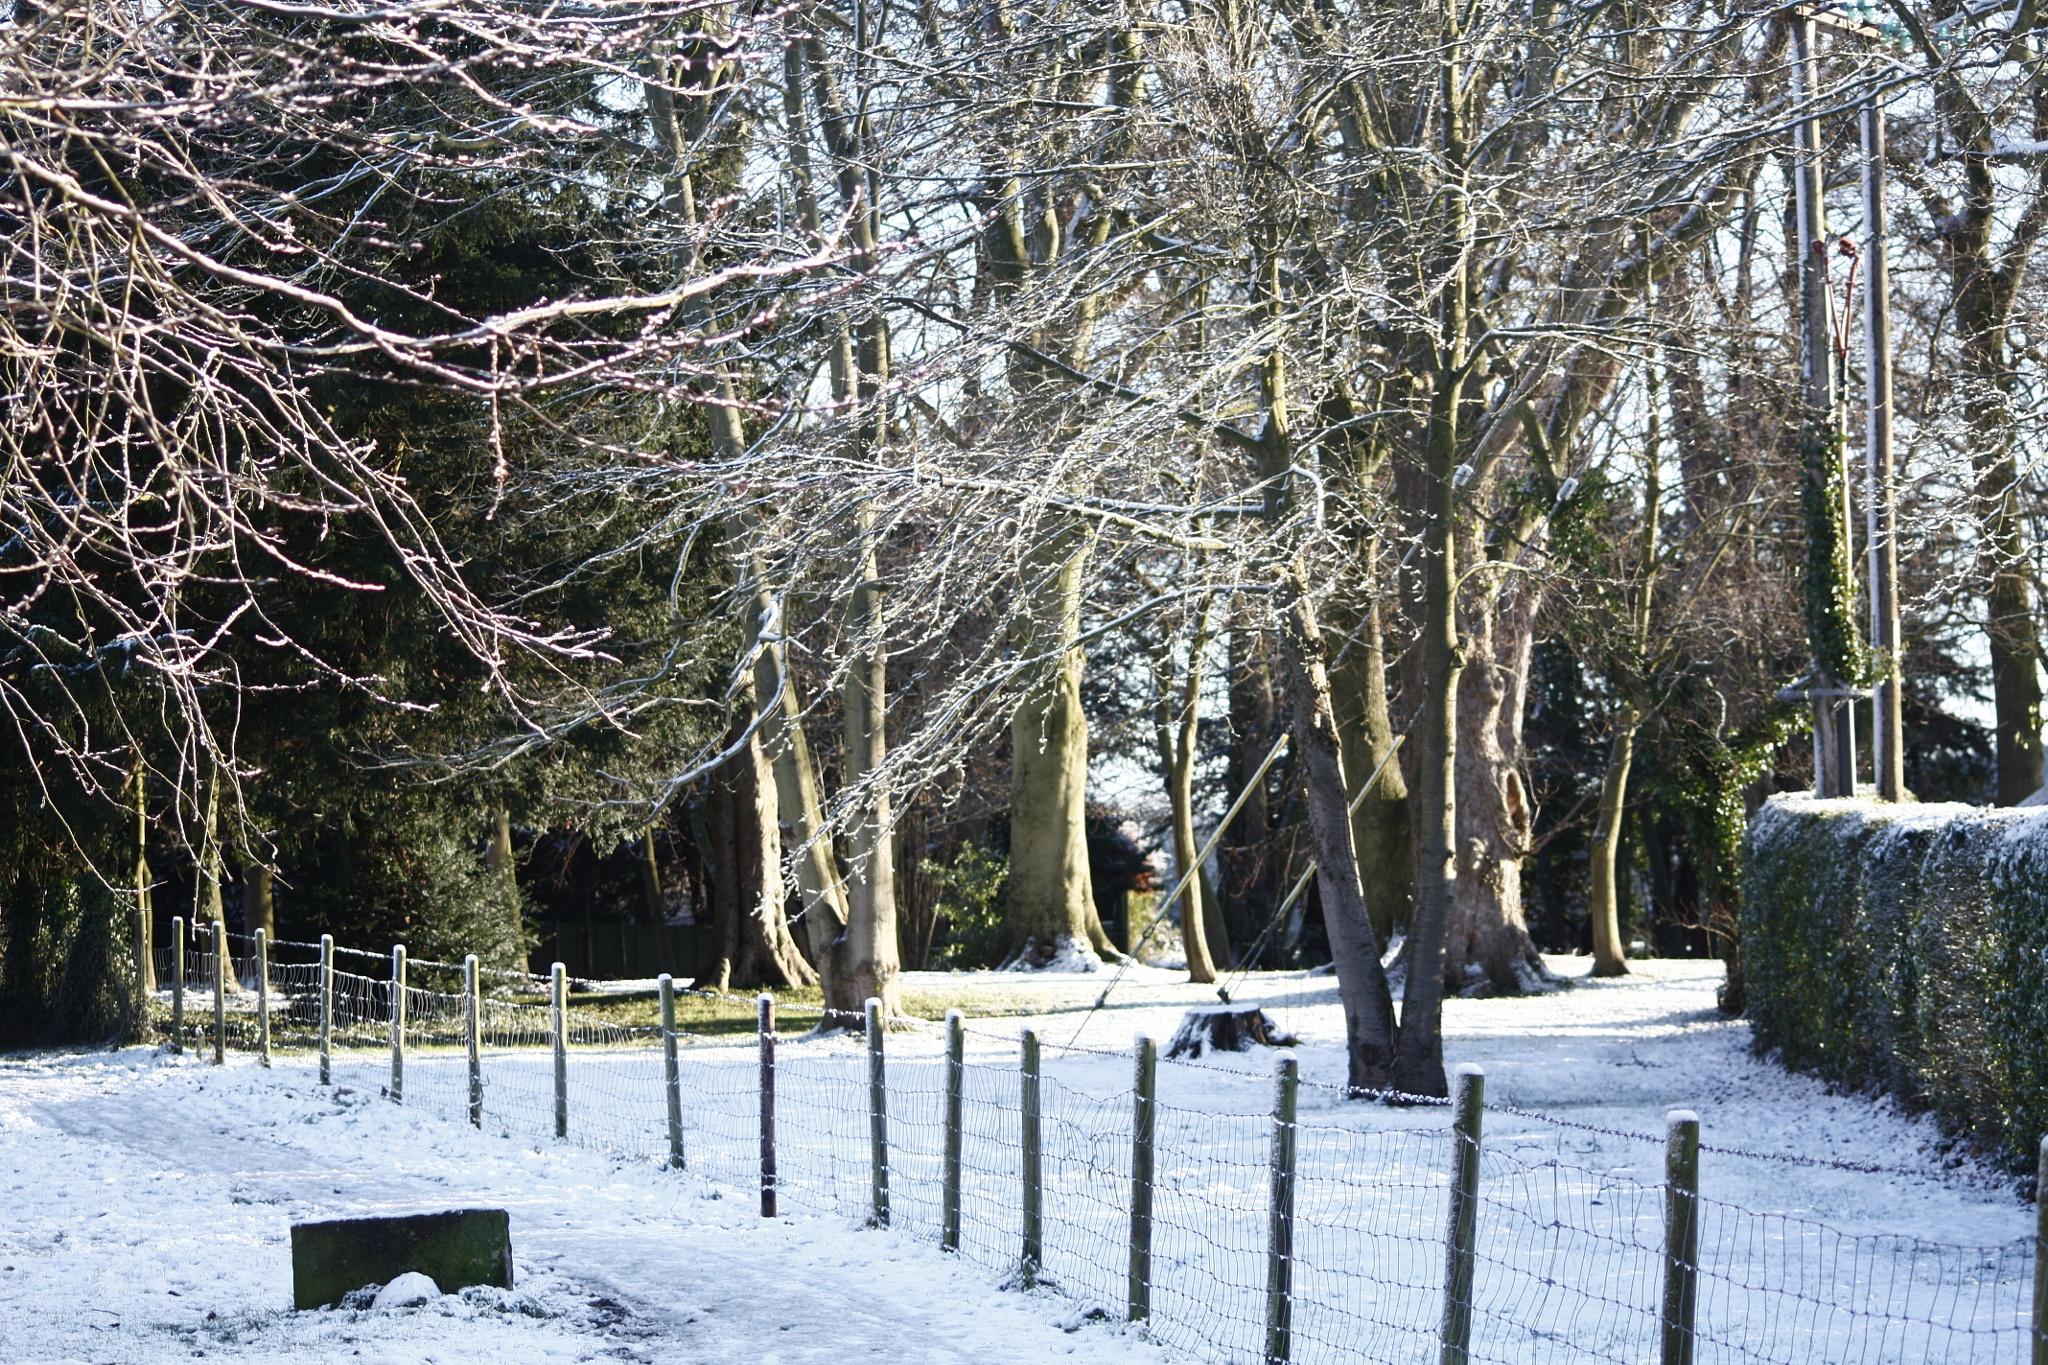 Sun and Snow by martin.davis.5243817